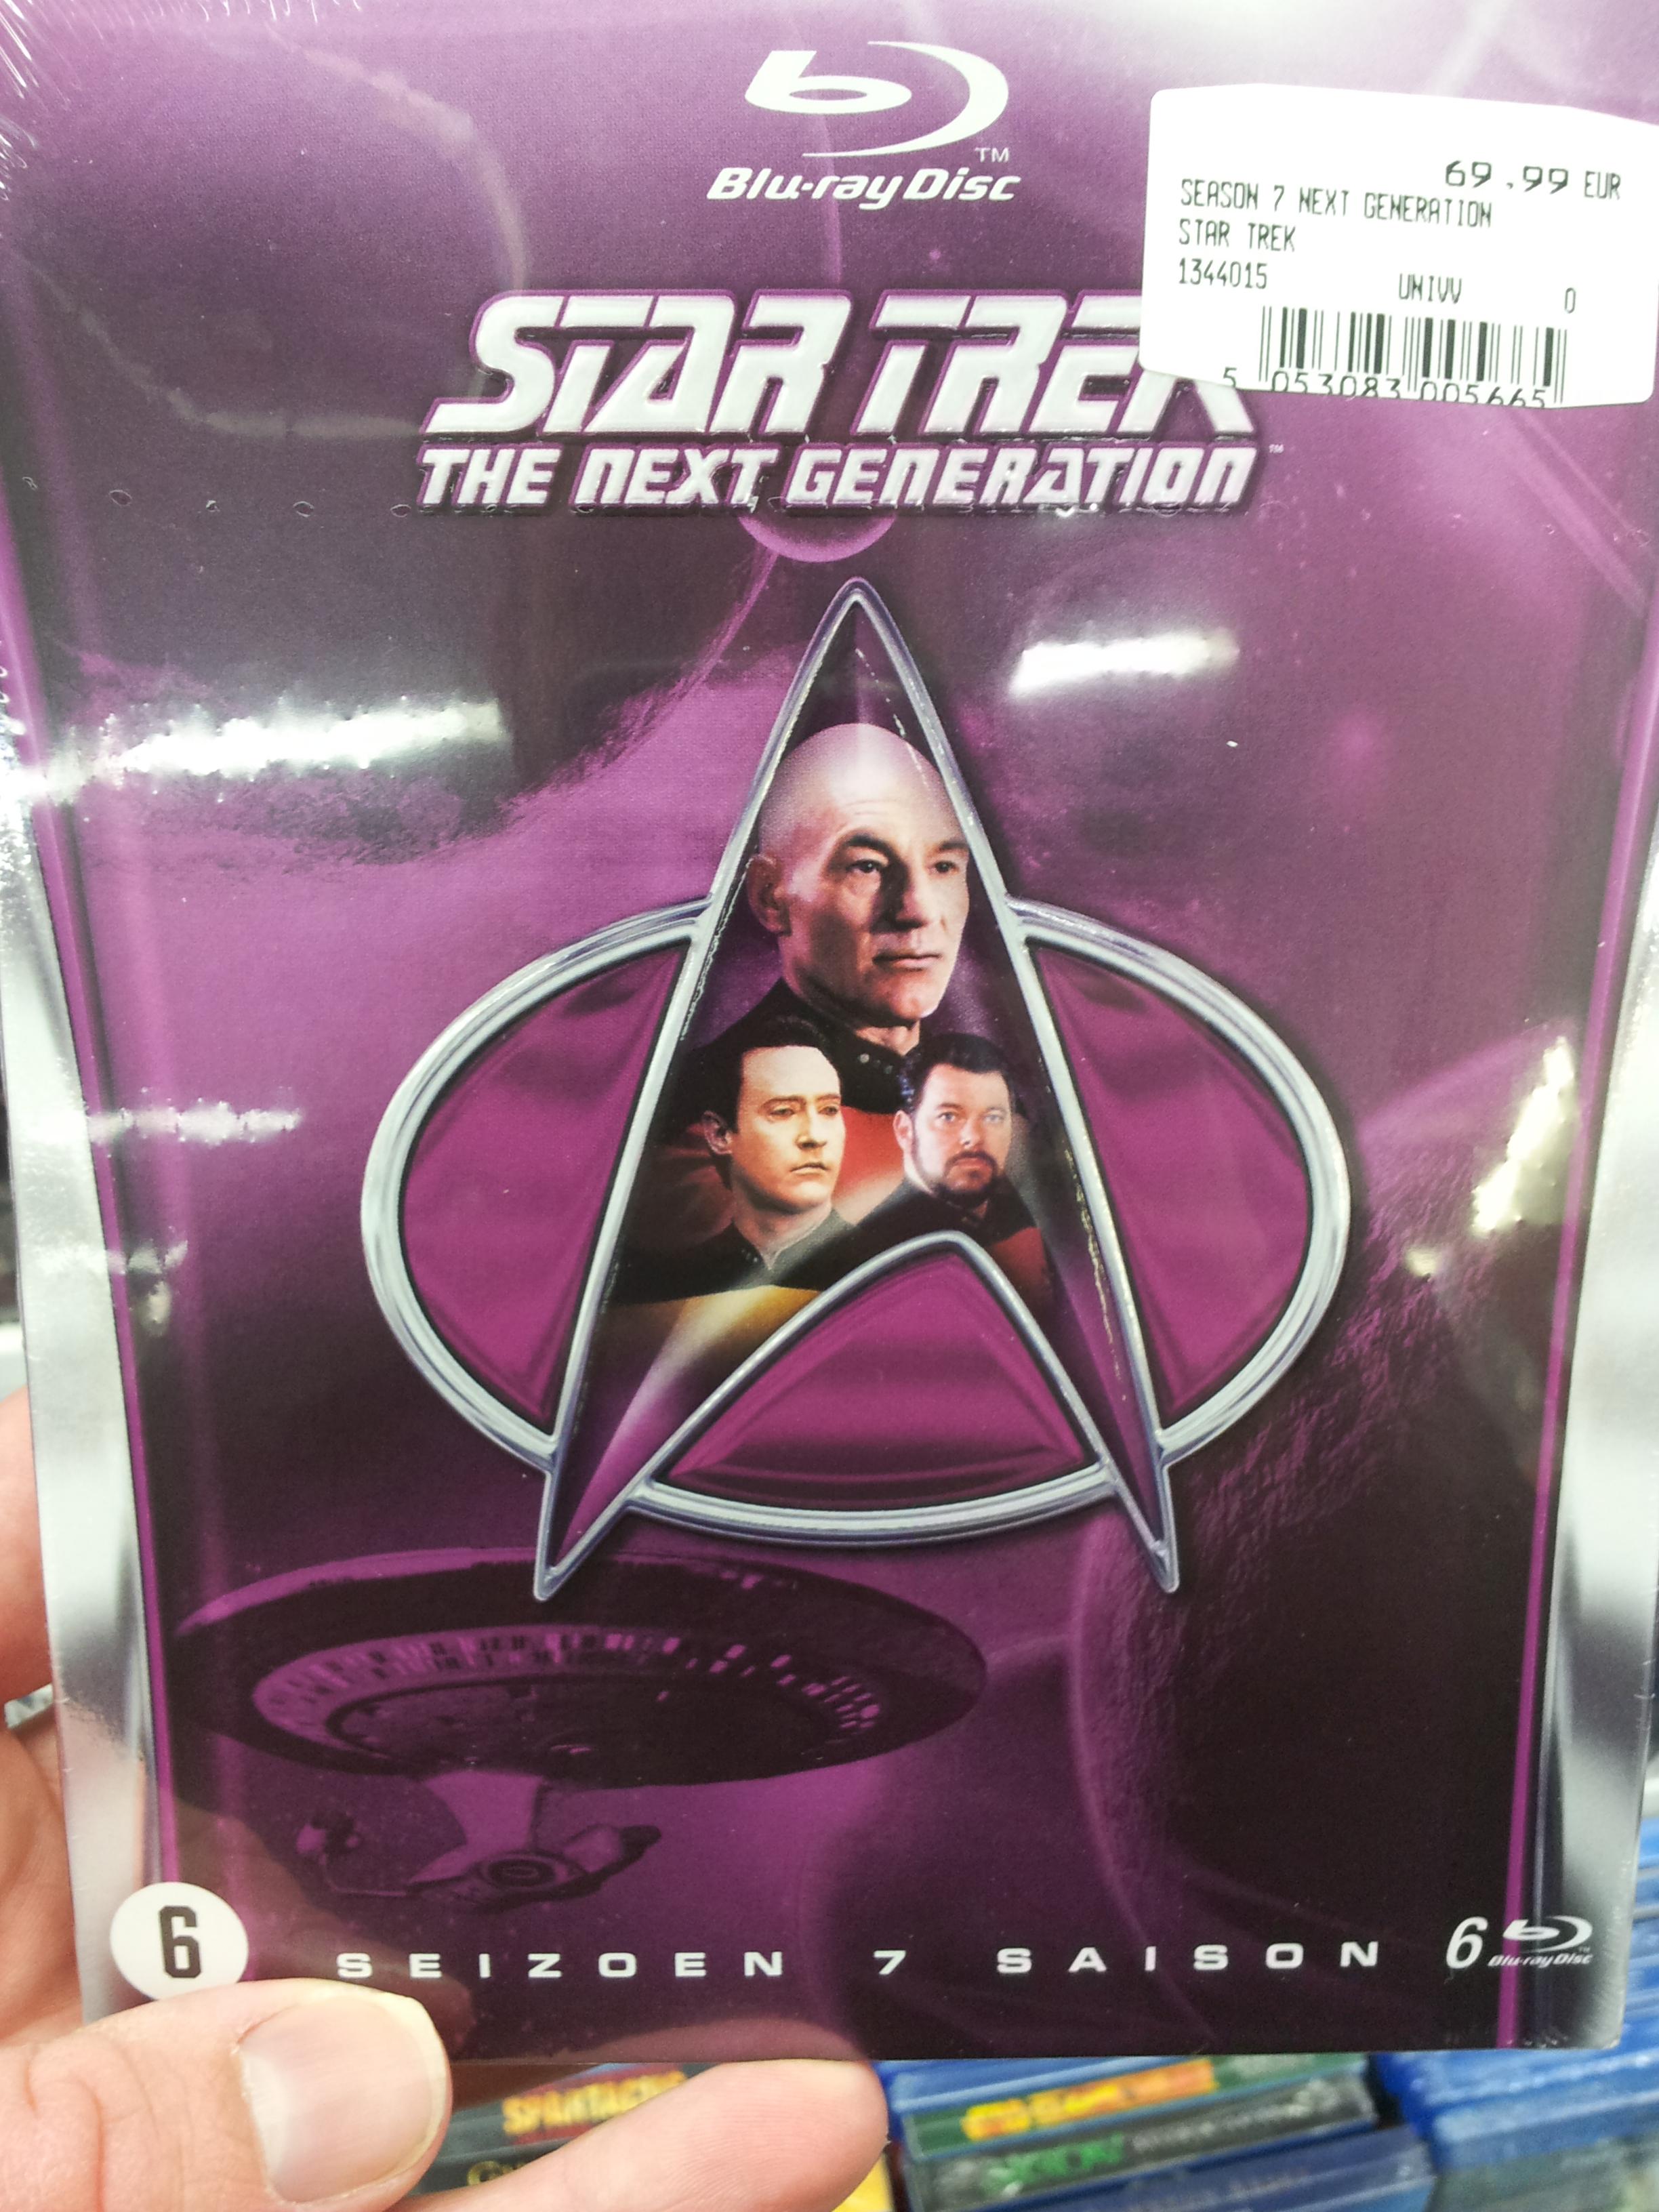 Star Trek TNG Season 7 Blu Ray cover of boxset